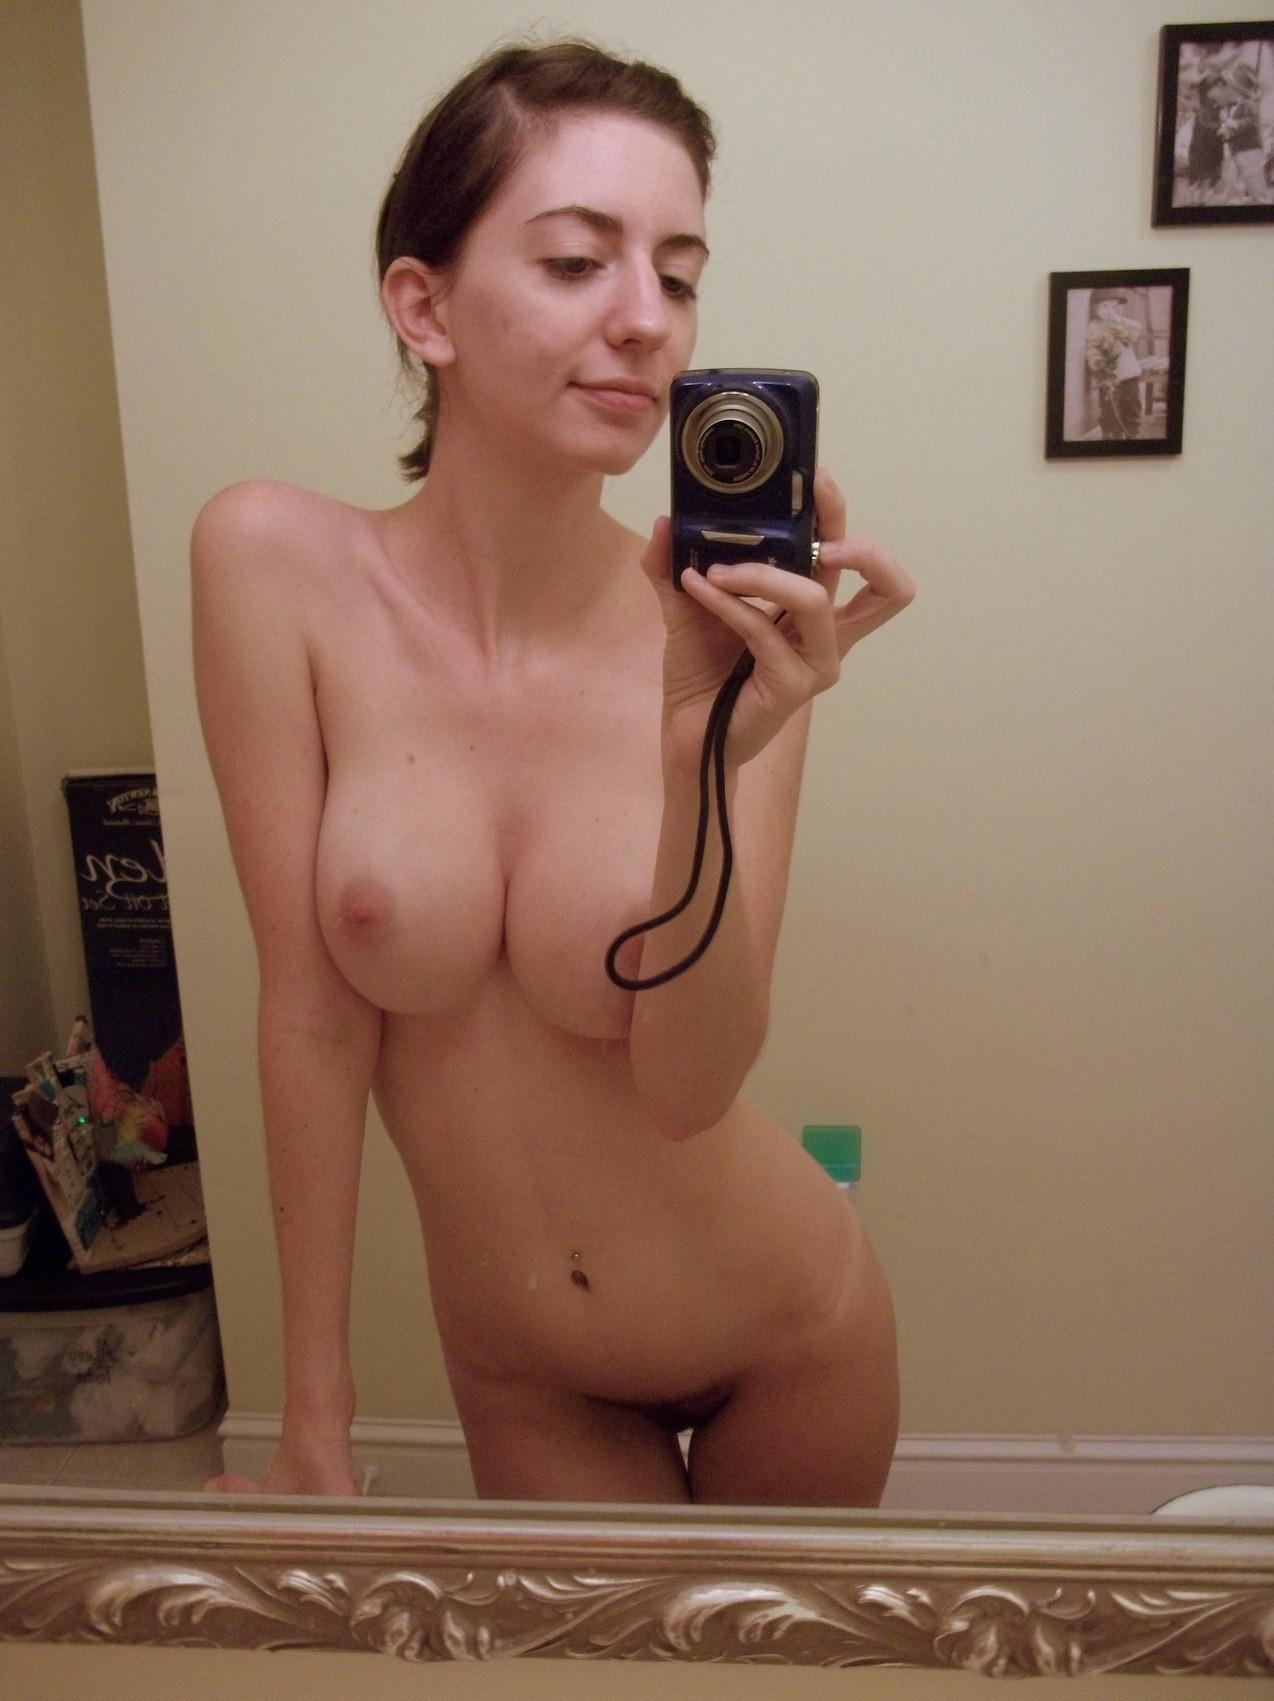 fille nue du 24 veut s'exciter en image